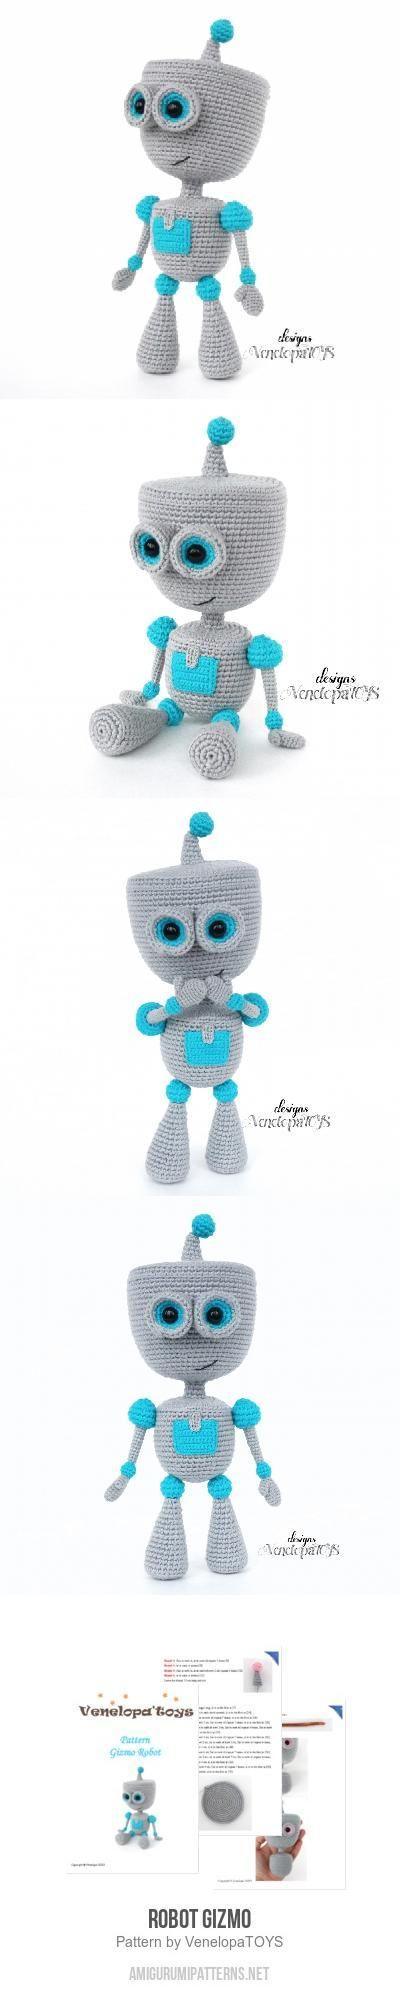 Robot Gizmo amigurumi pattern #instructionstodollpatterns